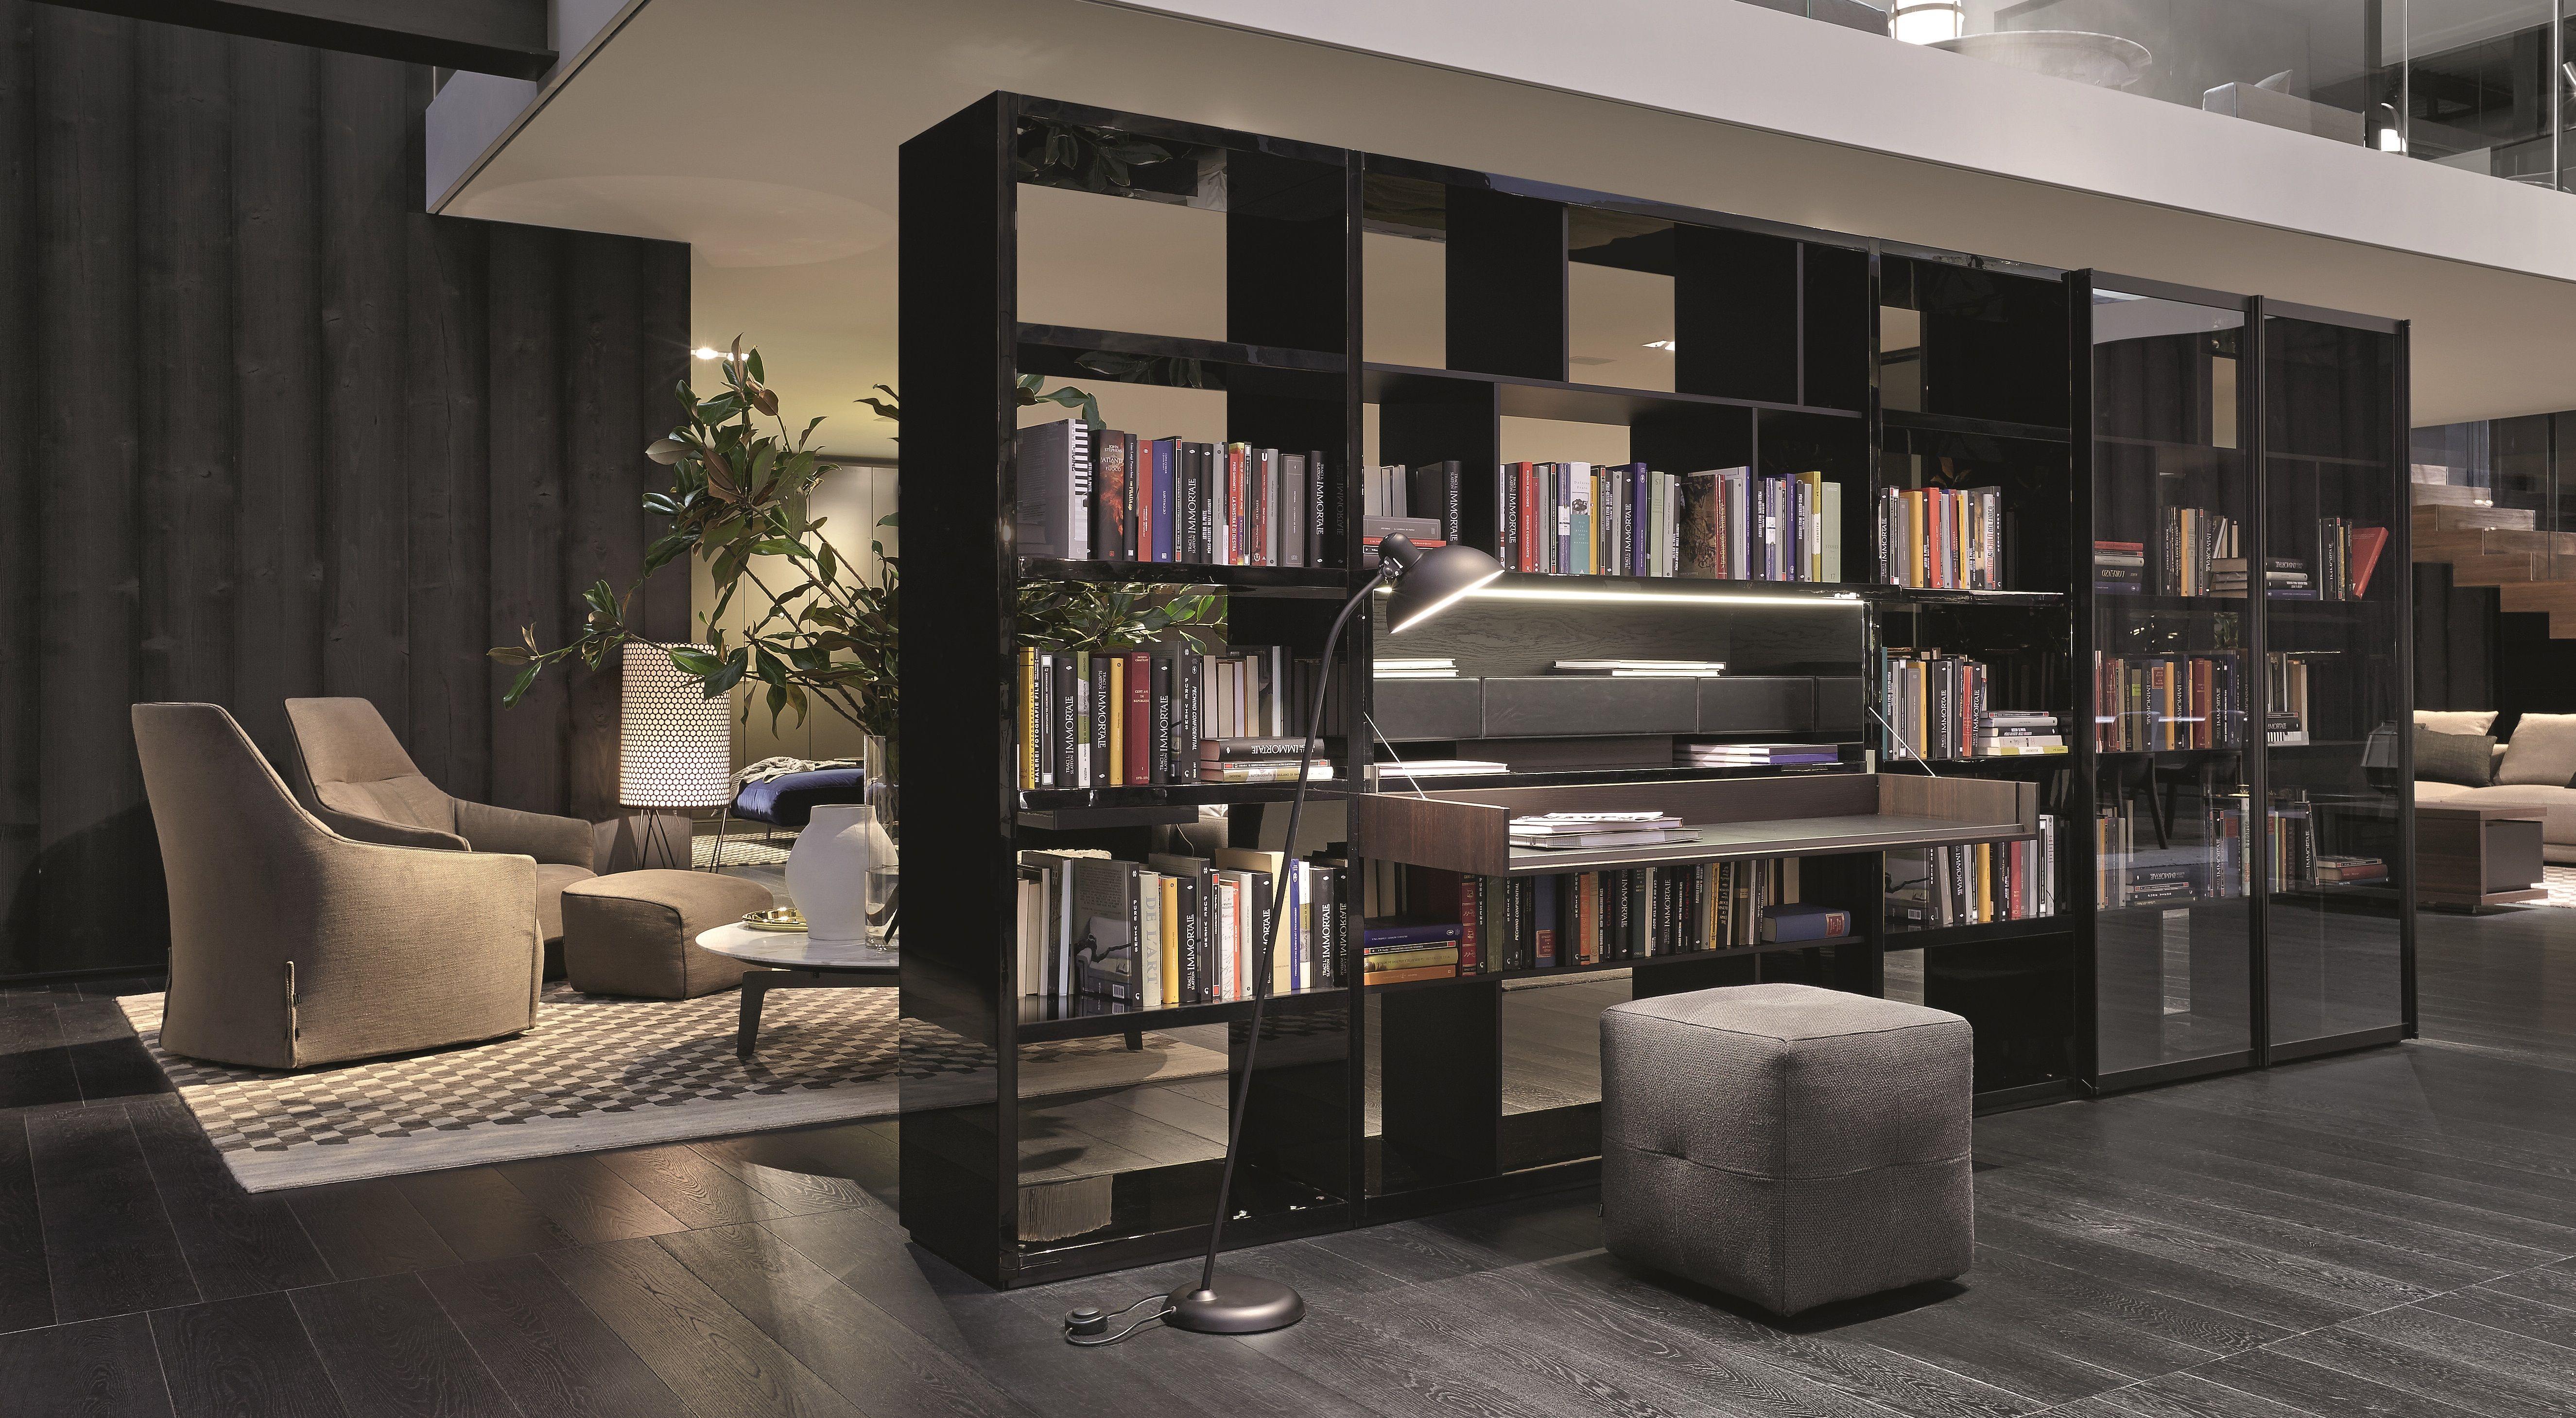 Pouf Soggiorno ~ Poliformvarenna wall system bookshelf and onda pouf details